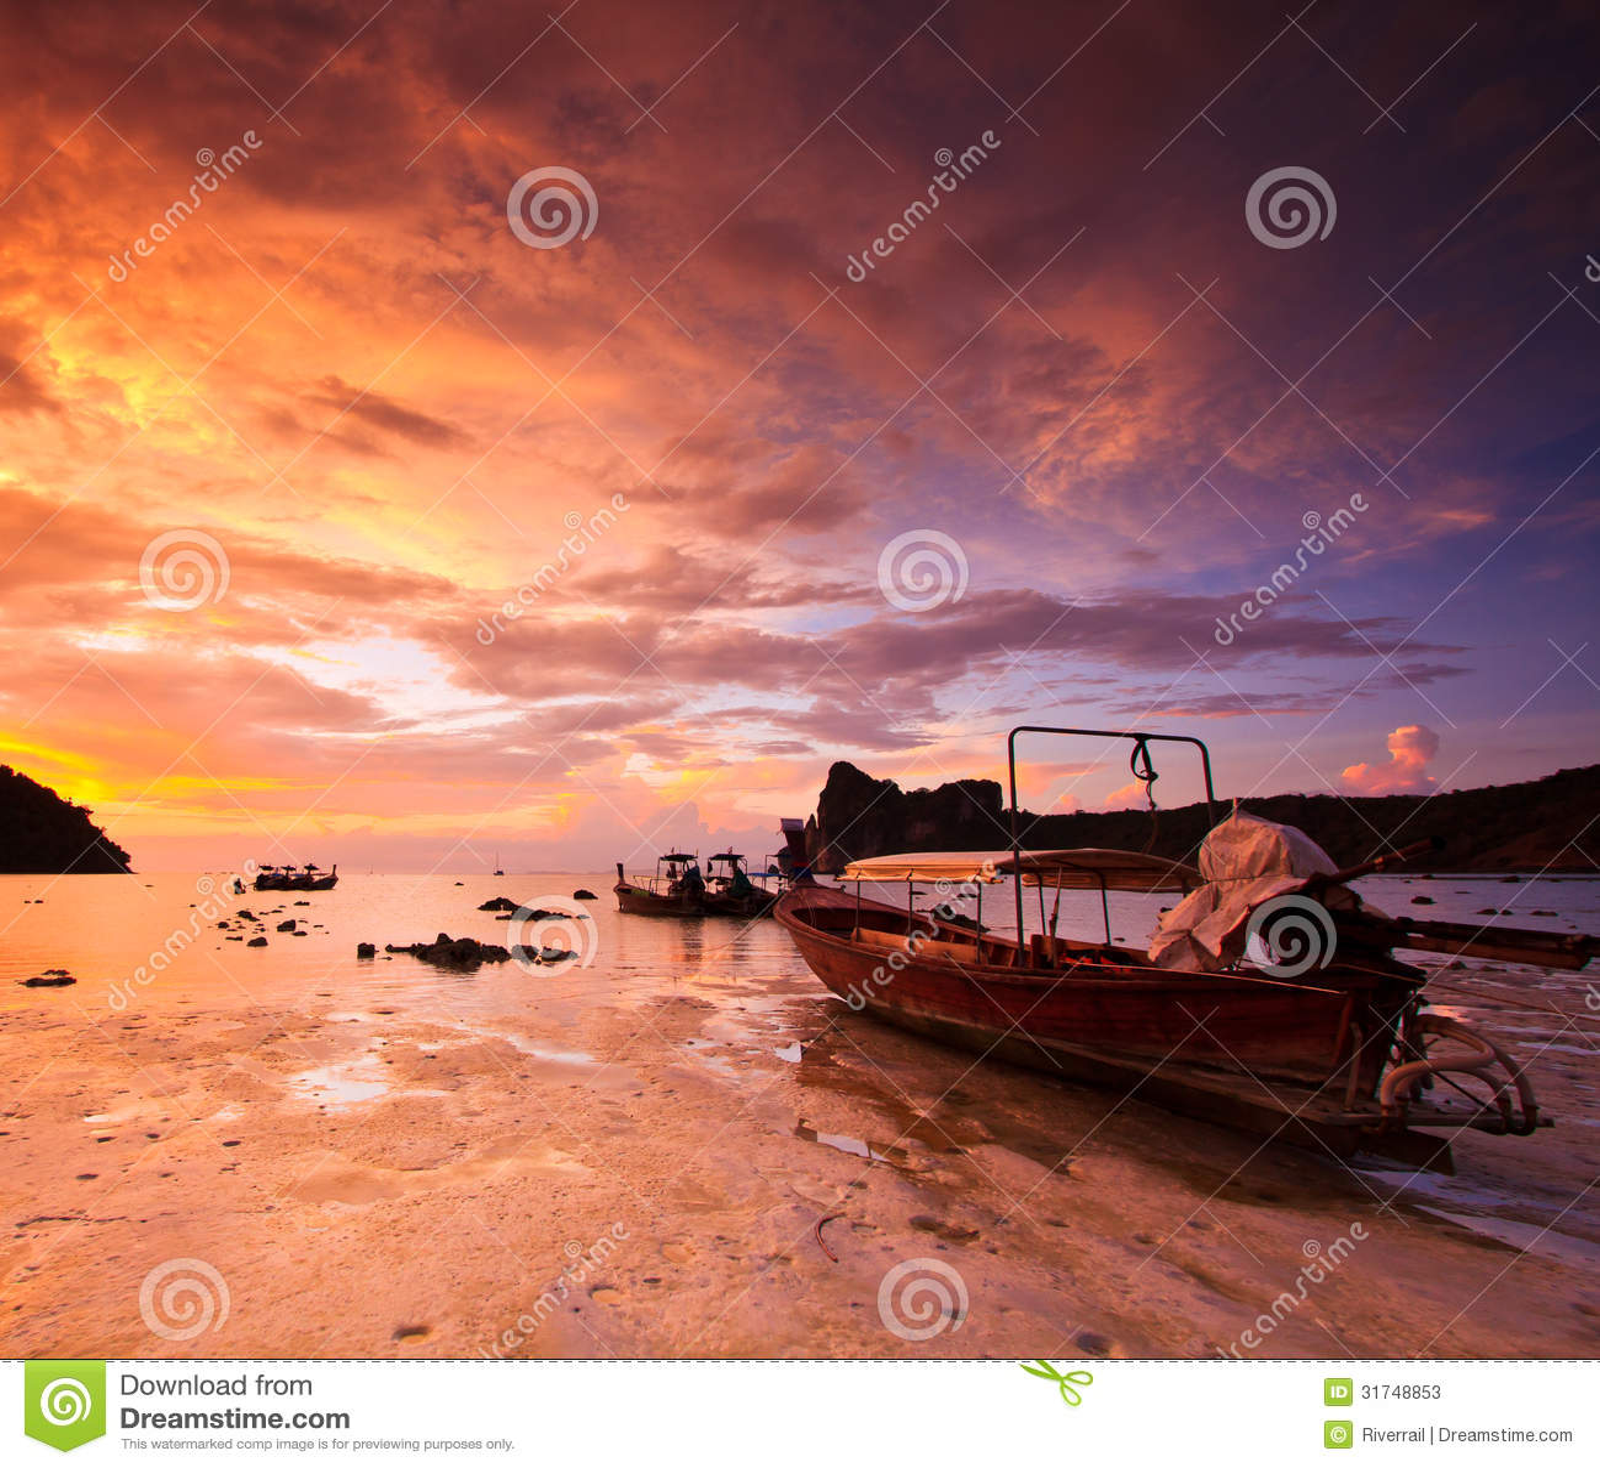 sunset sailing boats rocks - photo #26